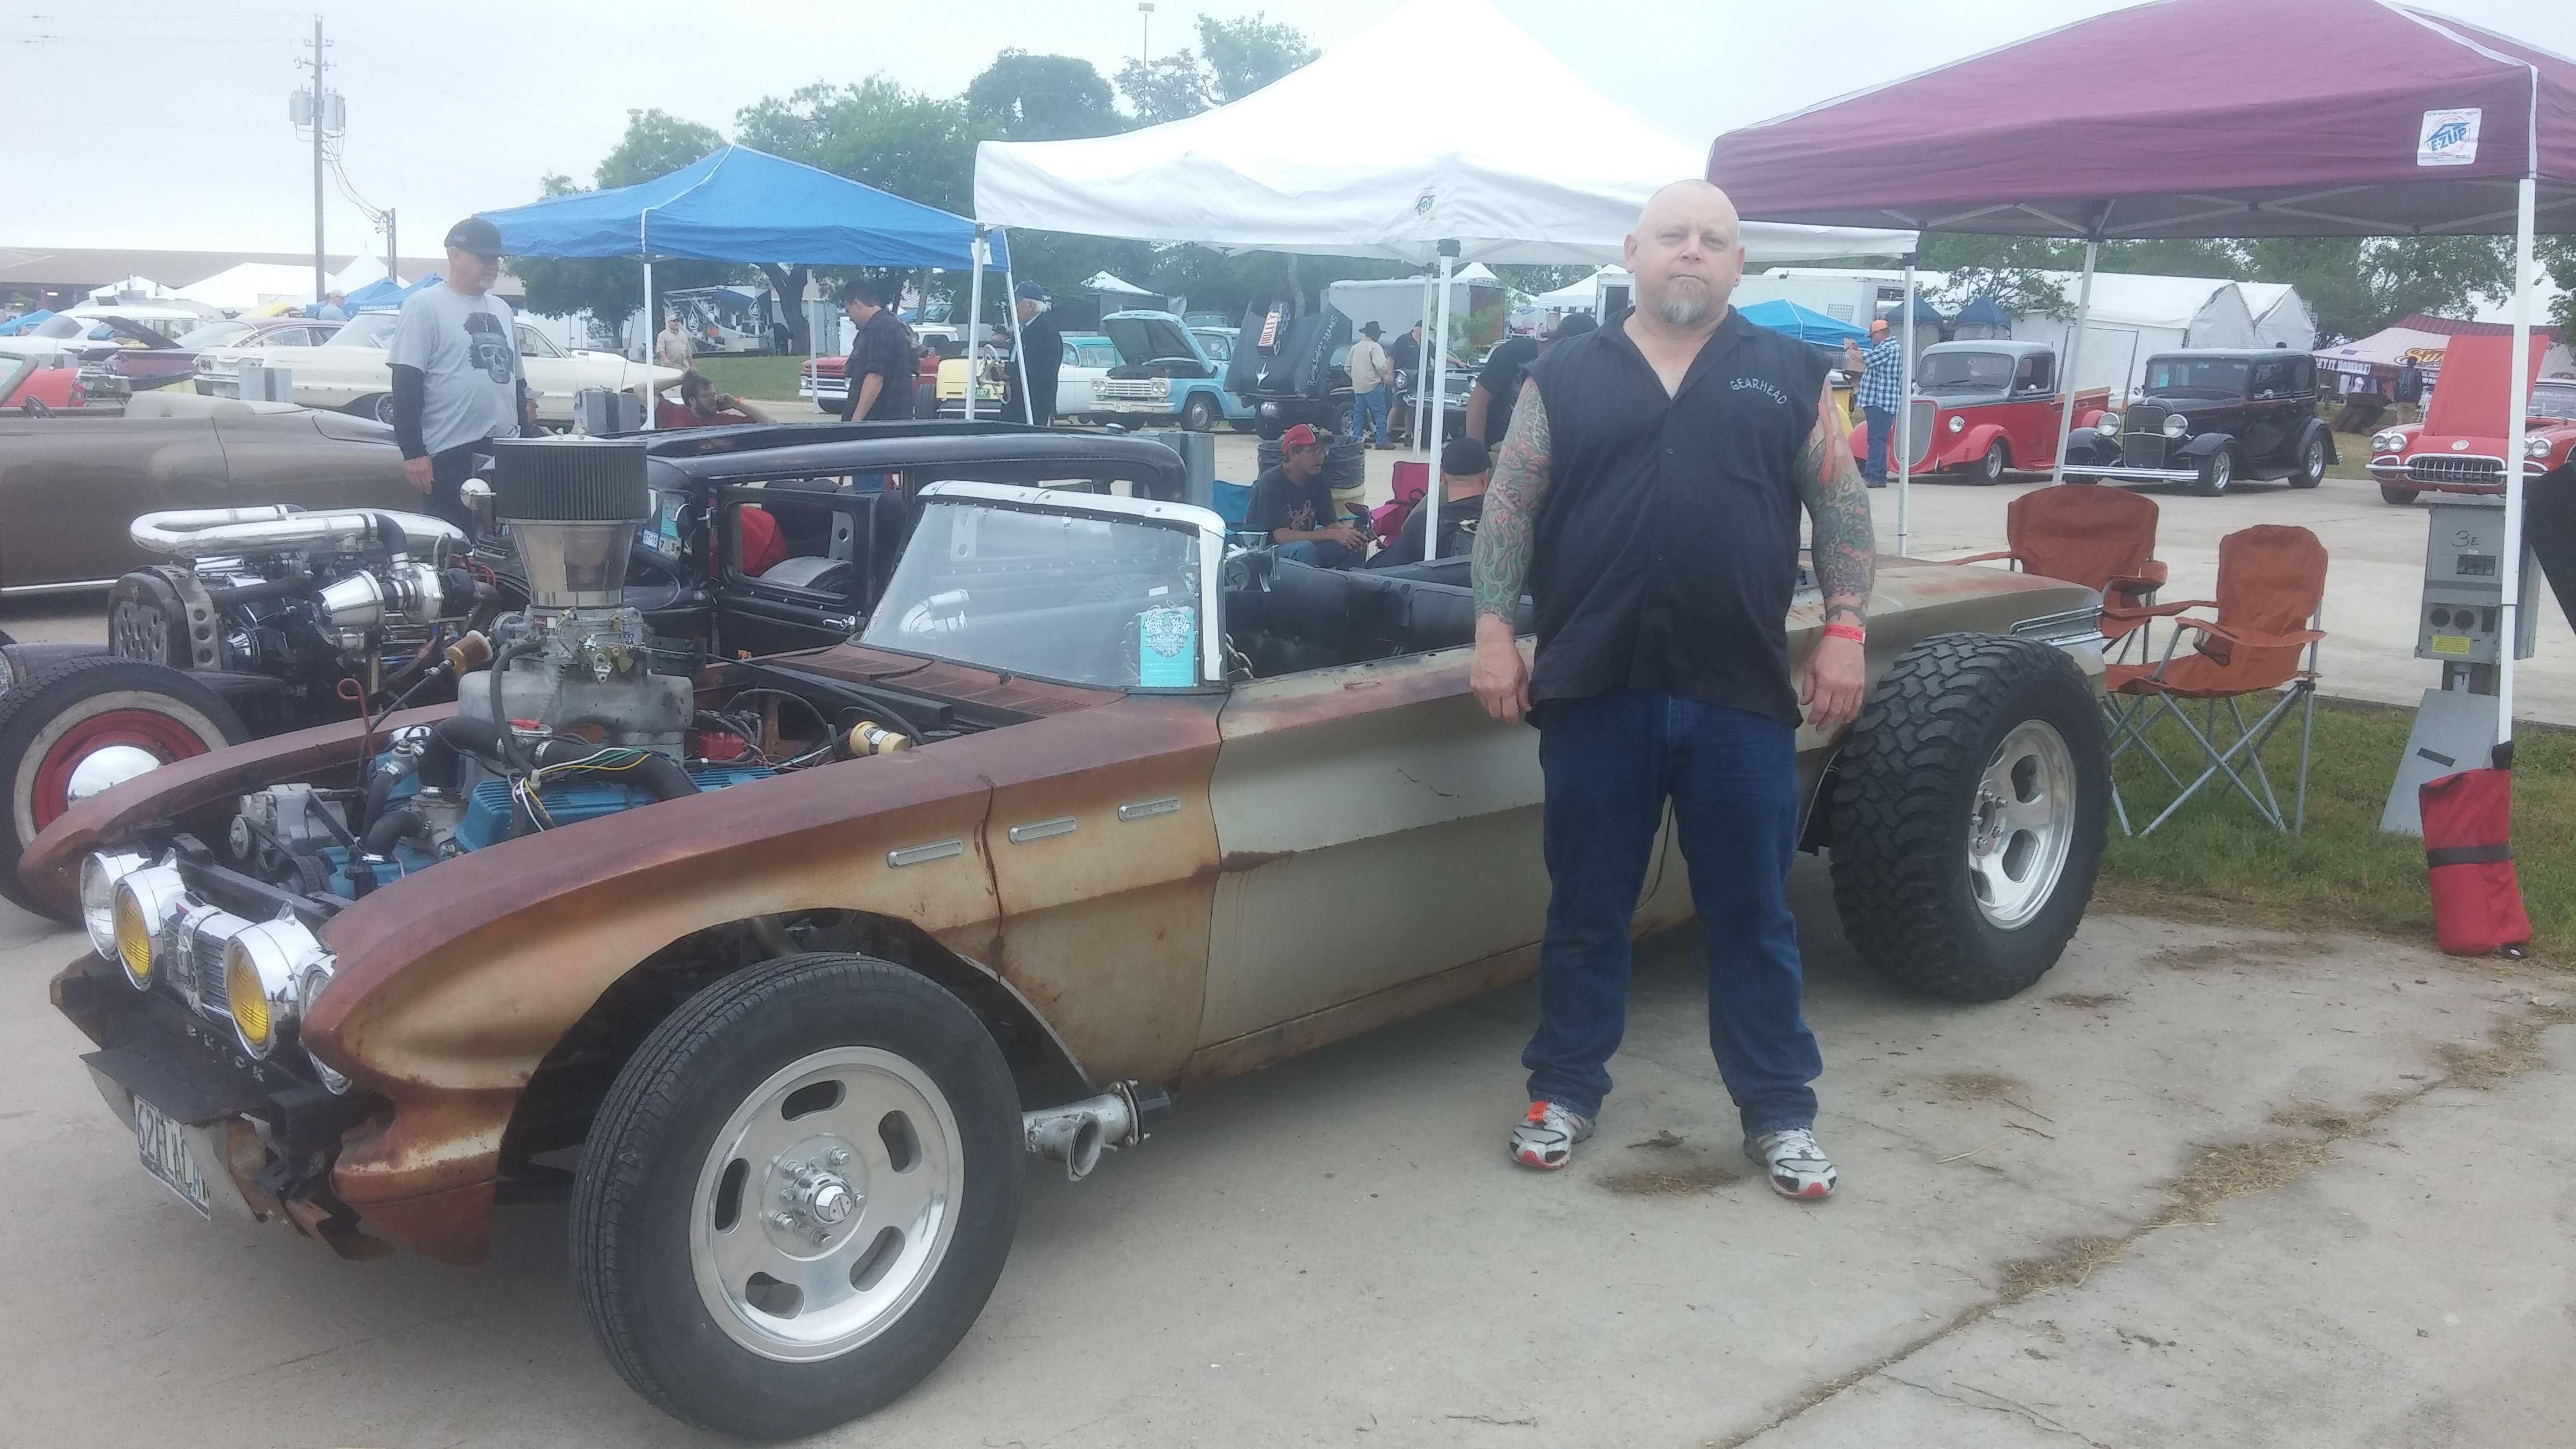 1962 Buick Skylark Rat Rod Rat Rod Rat Rods Truck Buick Skylark